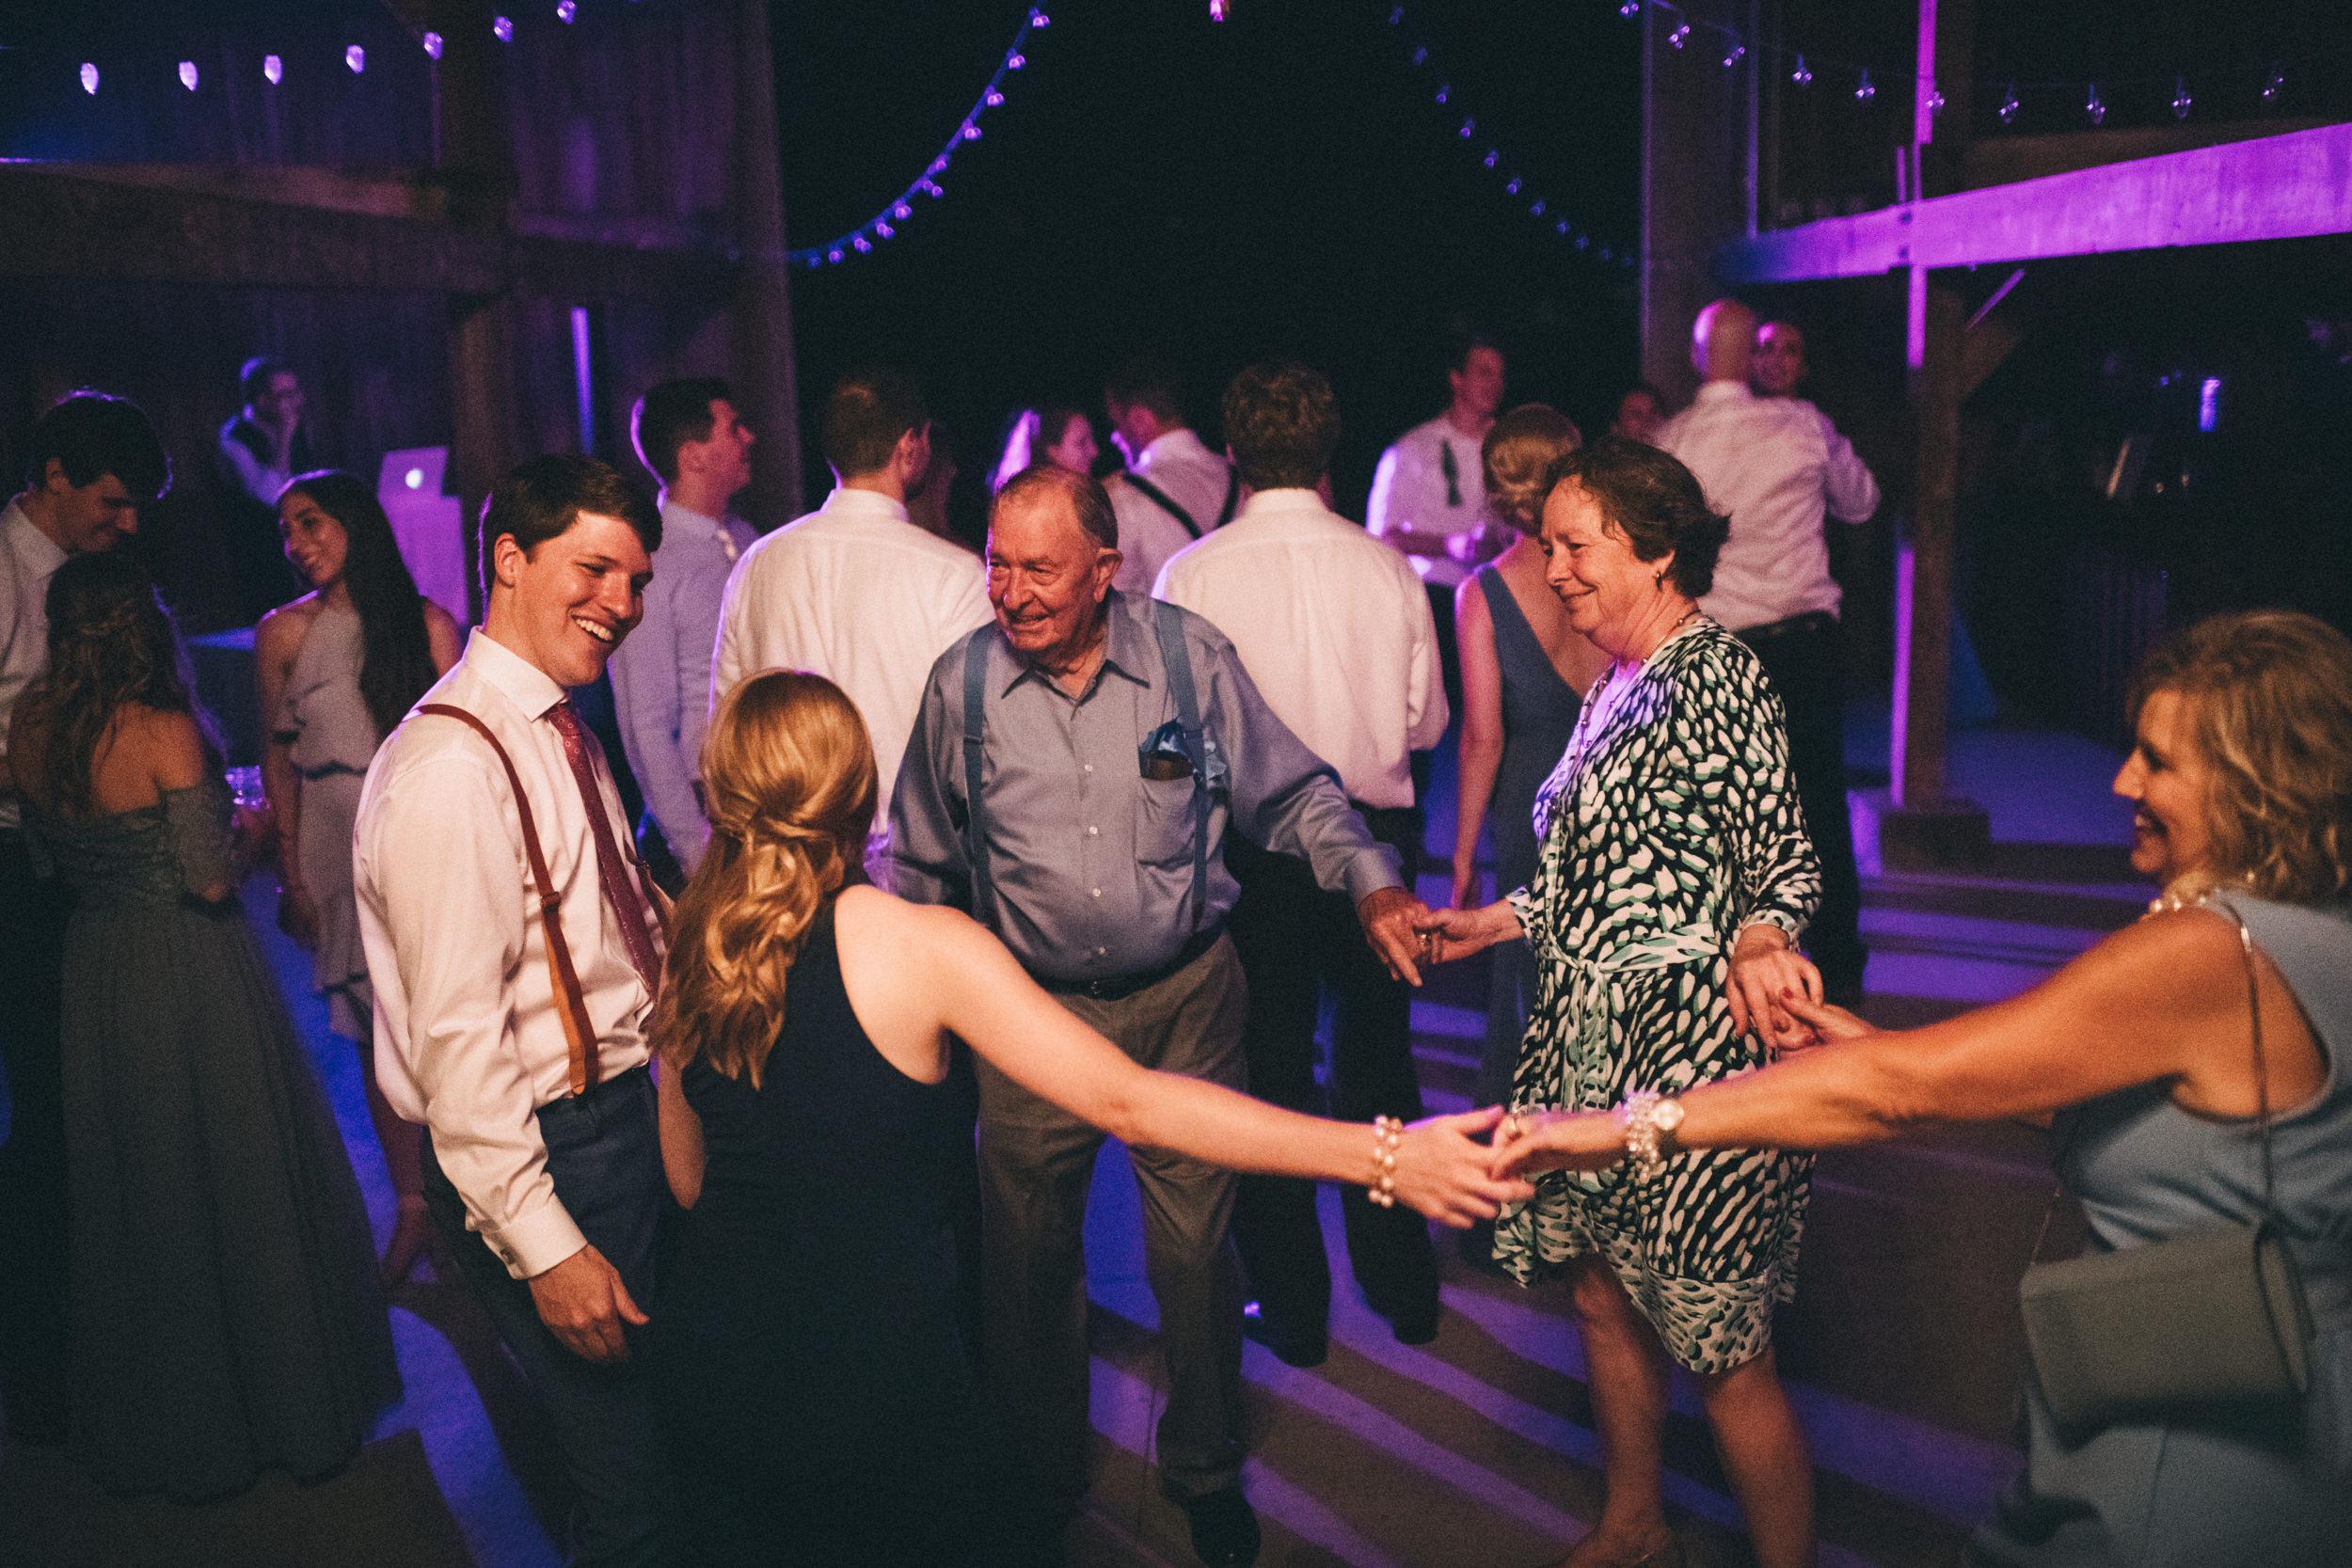 Louisville-Kentucky-Wedding-and-Elopement-Photographer-Sarah-Katherine-Davis-Photography-Summer-Jewel-Toned-Wedding-Chineese-Tea-Ceremony-Warrenwood-Manor-Danville-1048.jpg